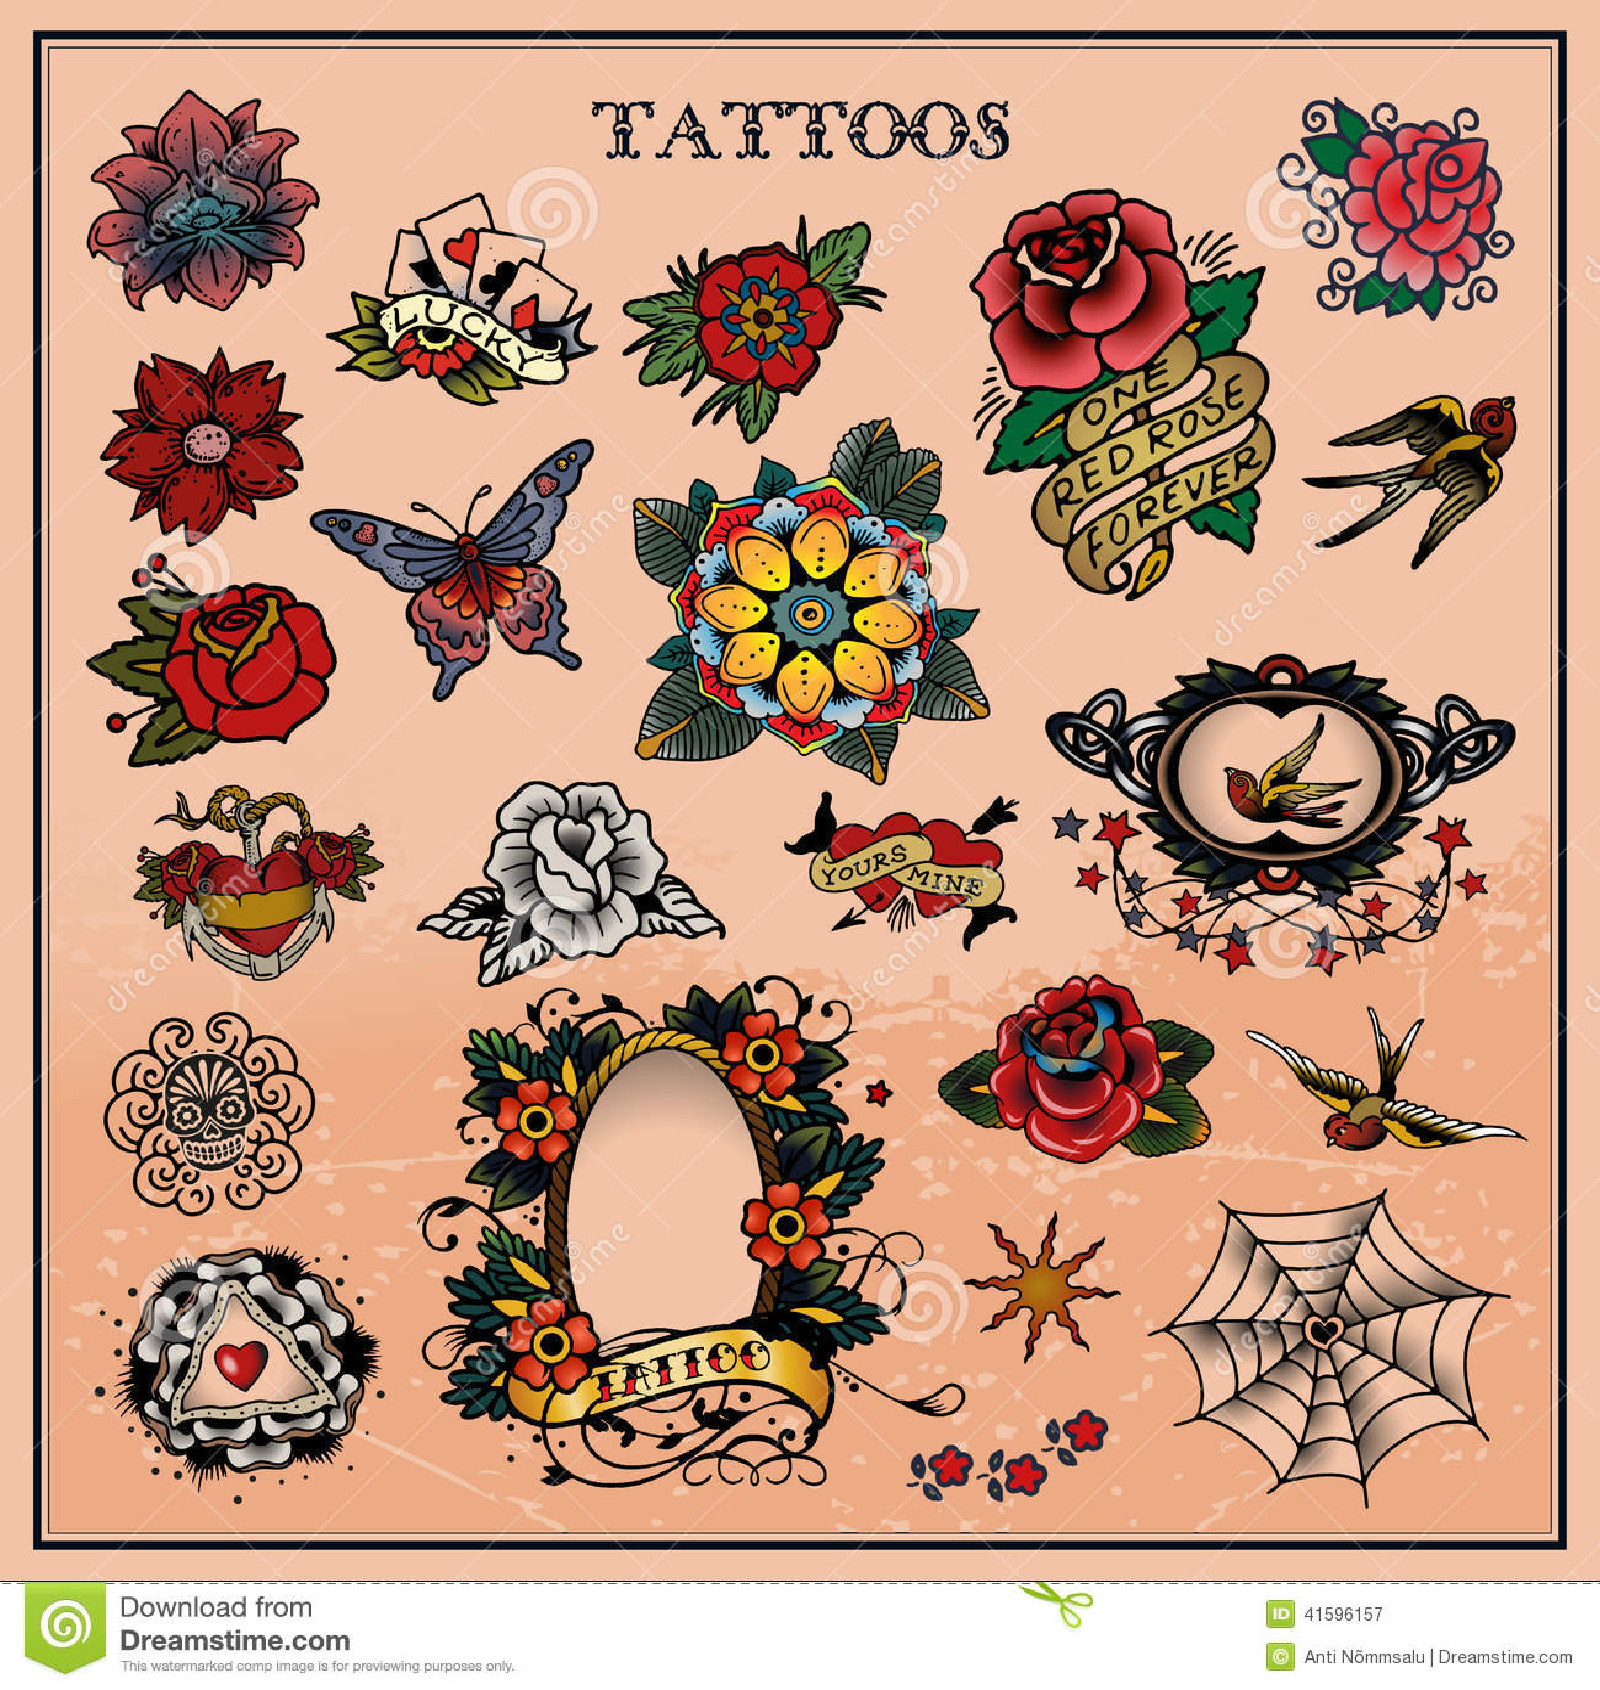 Fiori Old School.Tattoos Floral Flower Illustration 41596157 Megapixl